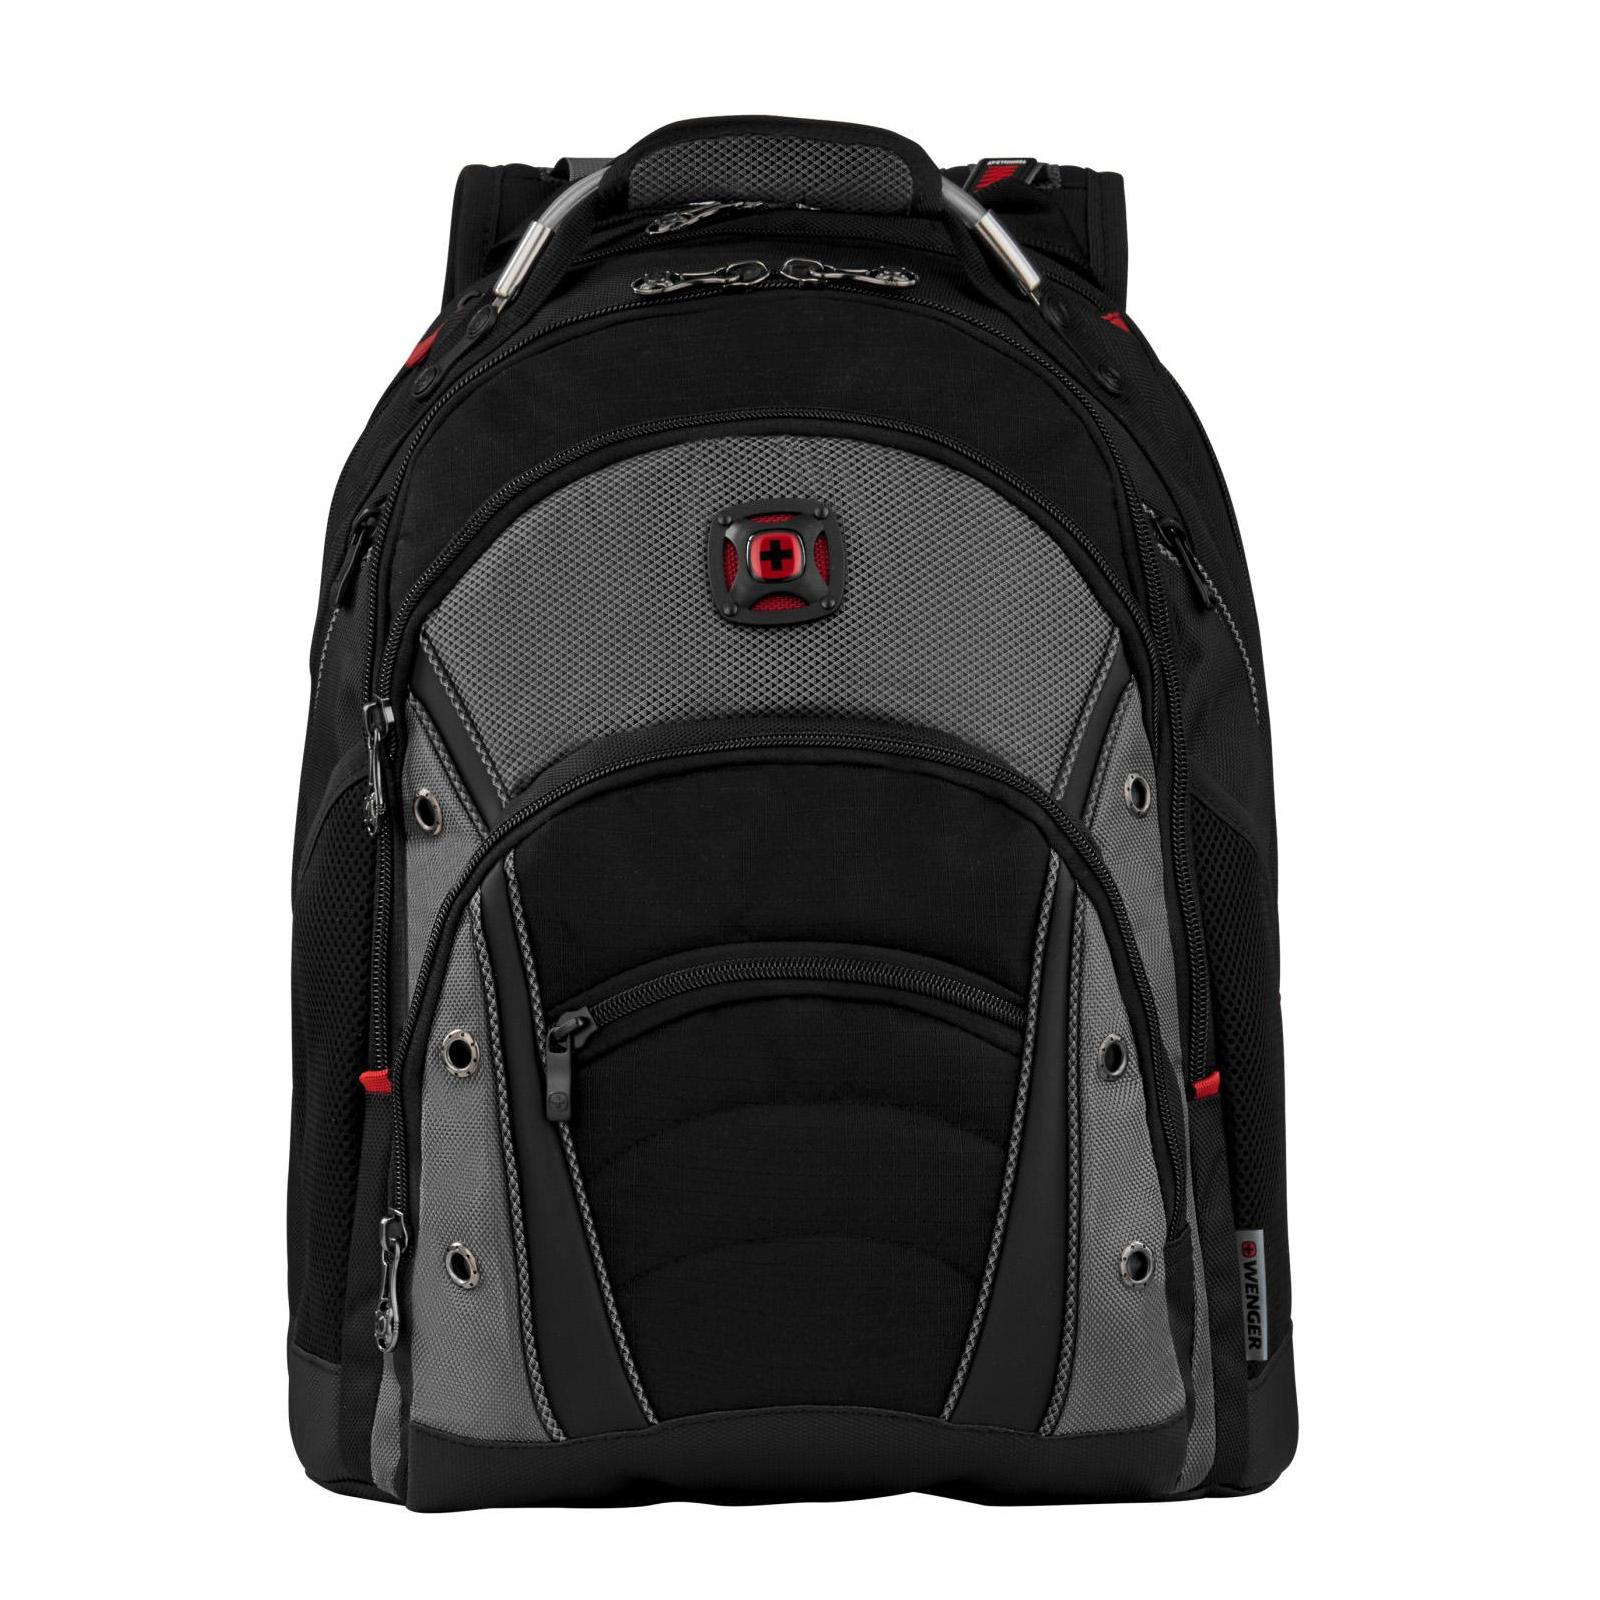 "Рюкзак для ноутбука Wenger 16"" Synergy Black/Gray (600635) изображение 2"